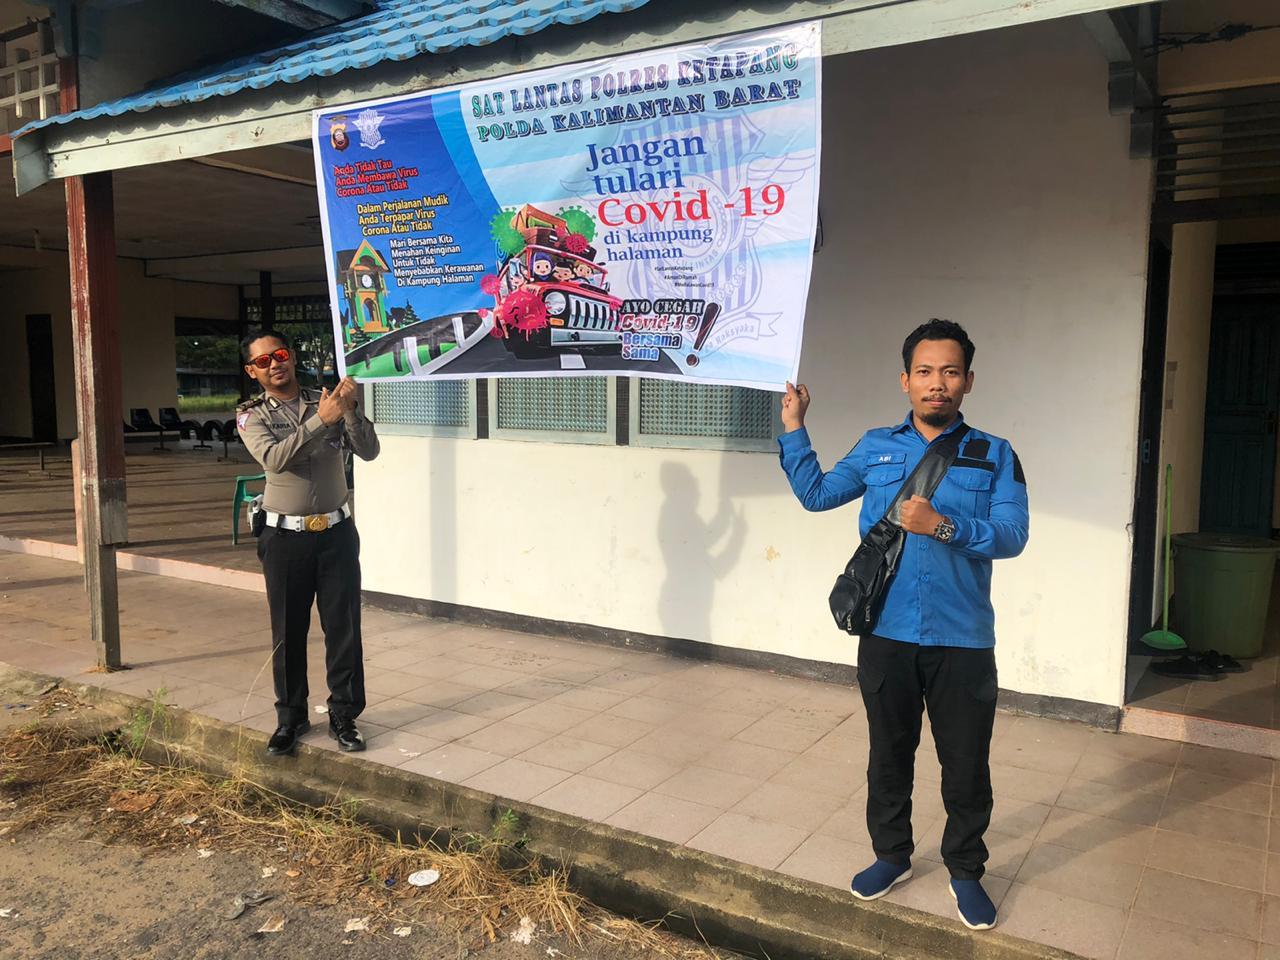 Antisipasi Lonjakan Mudik, Sat Lantas Polres Ketapang Pasang Spanduk Tunda Mudik